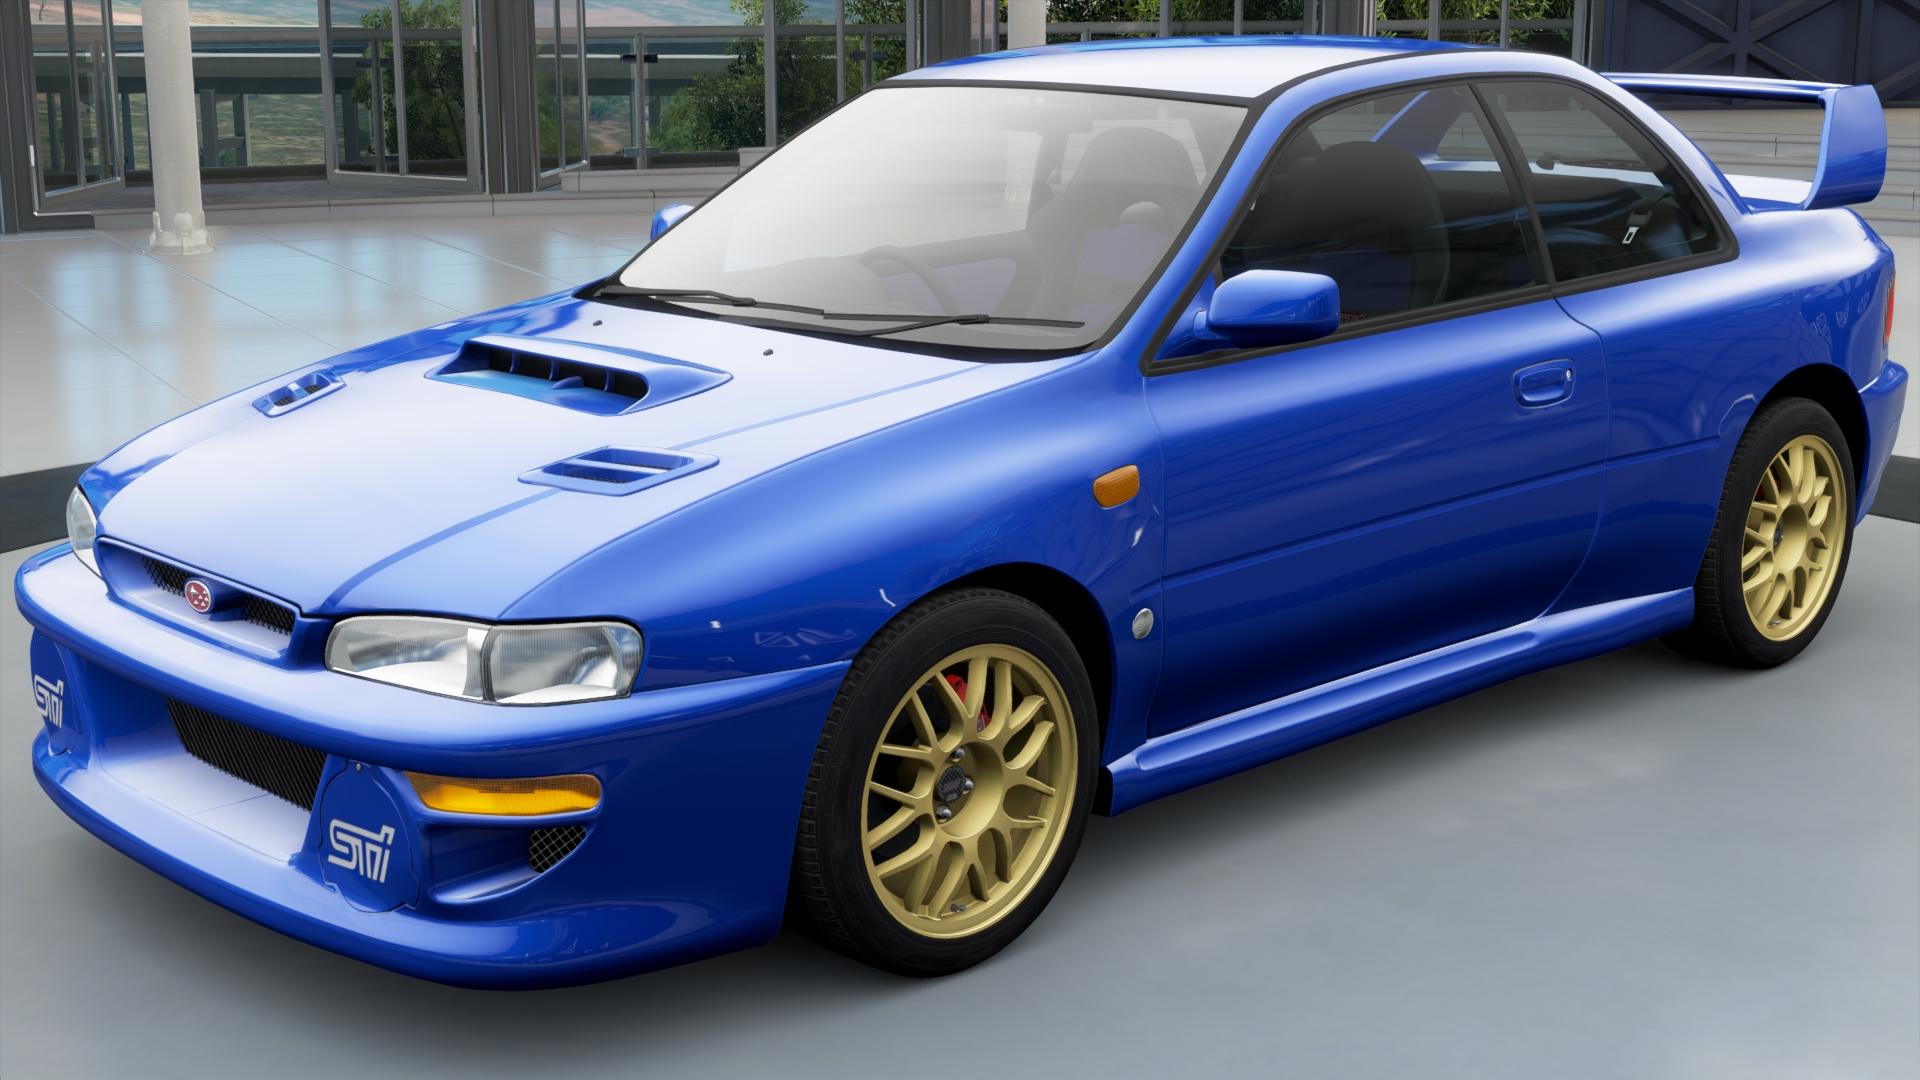 The 1998 Subaru Impreza 22b Sti In Forza Horizon 3